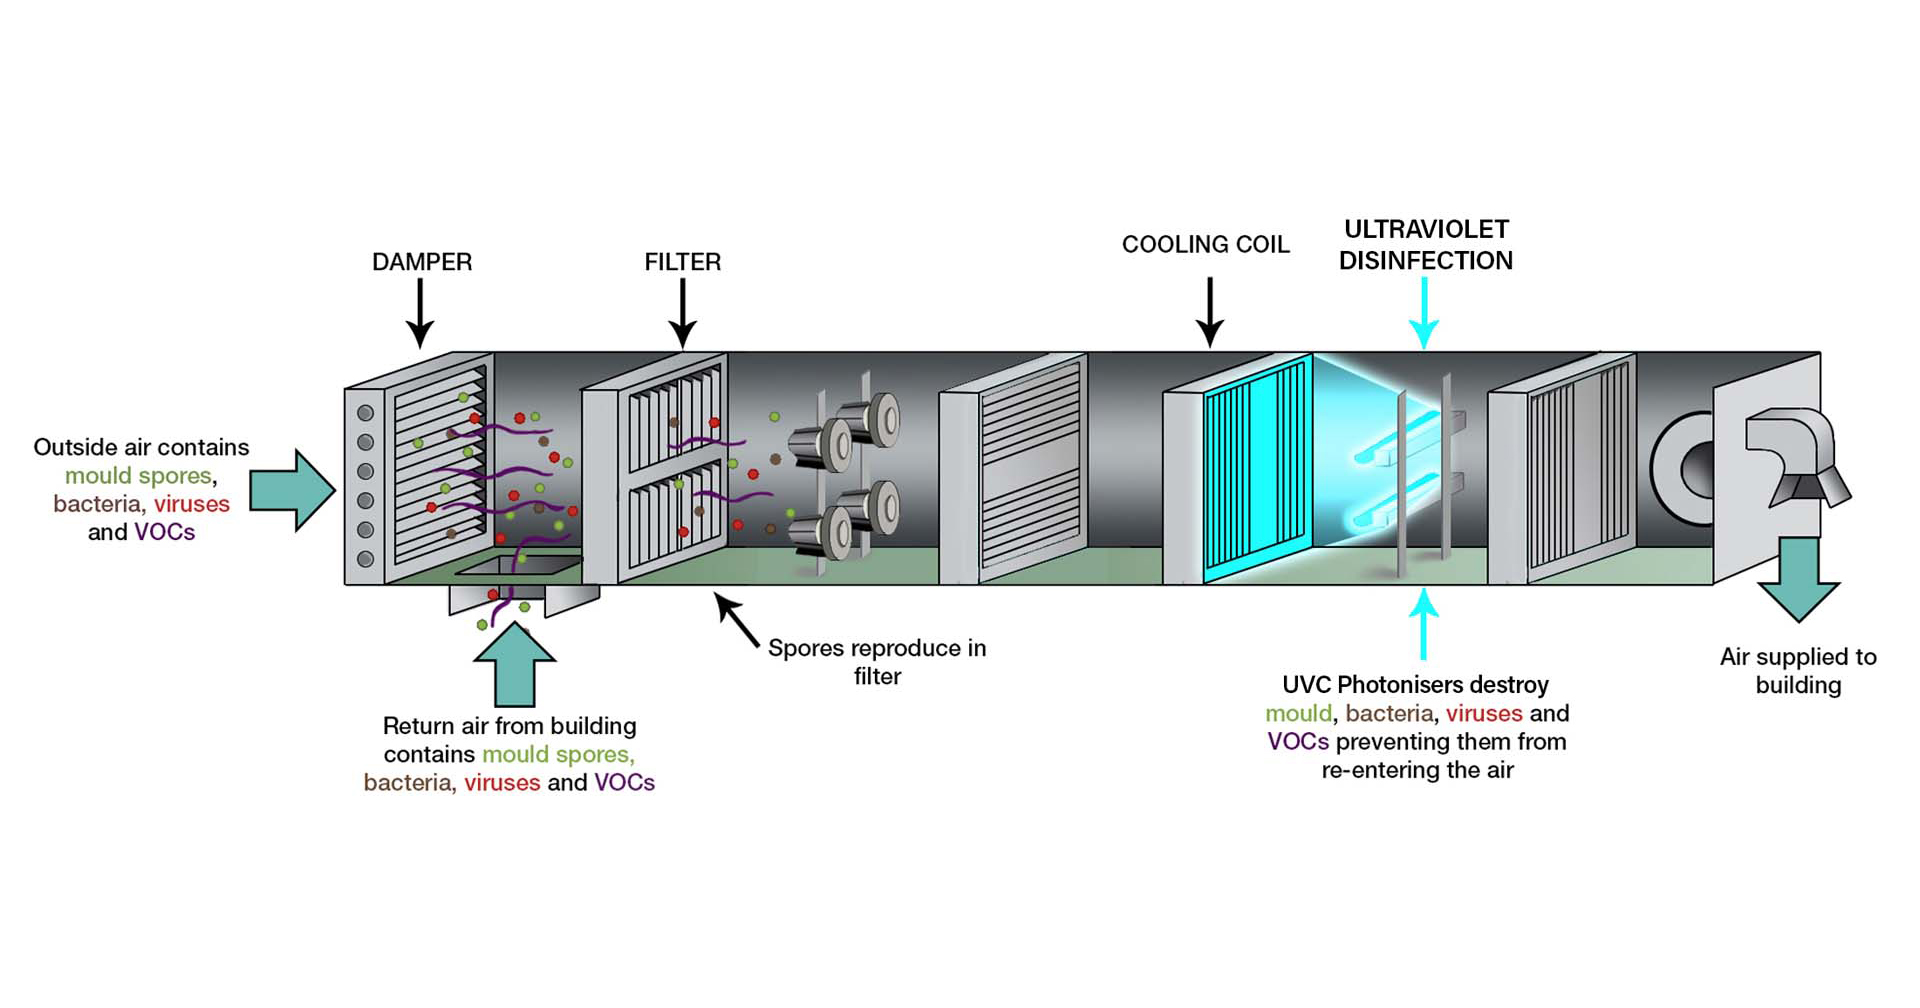 diagram of UVC lighting